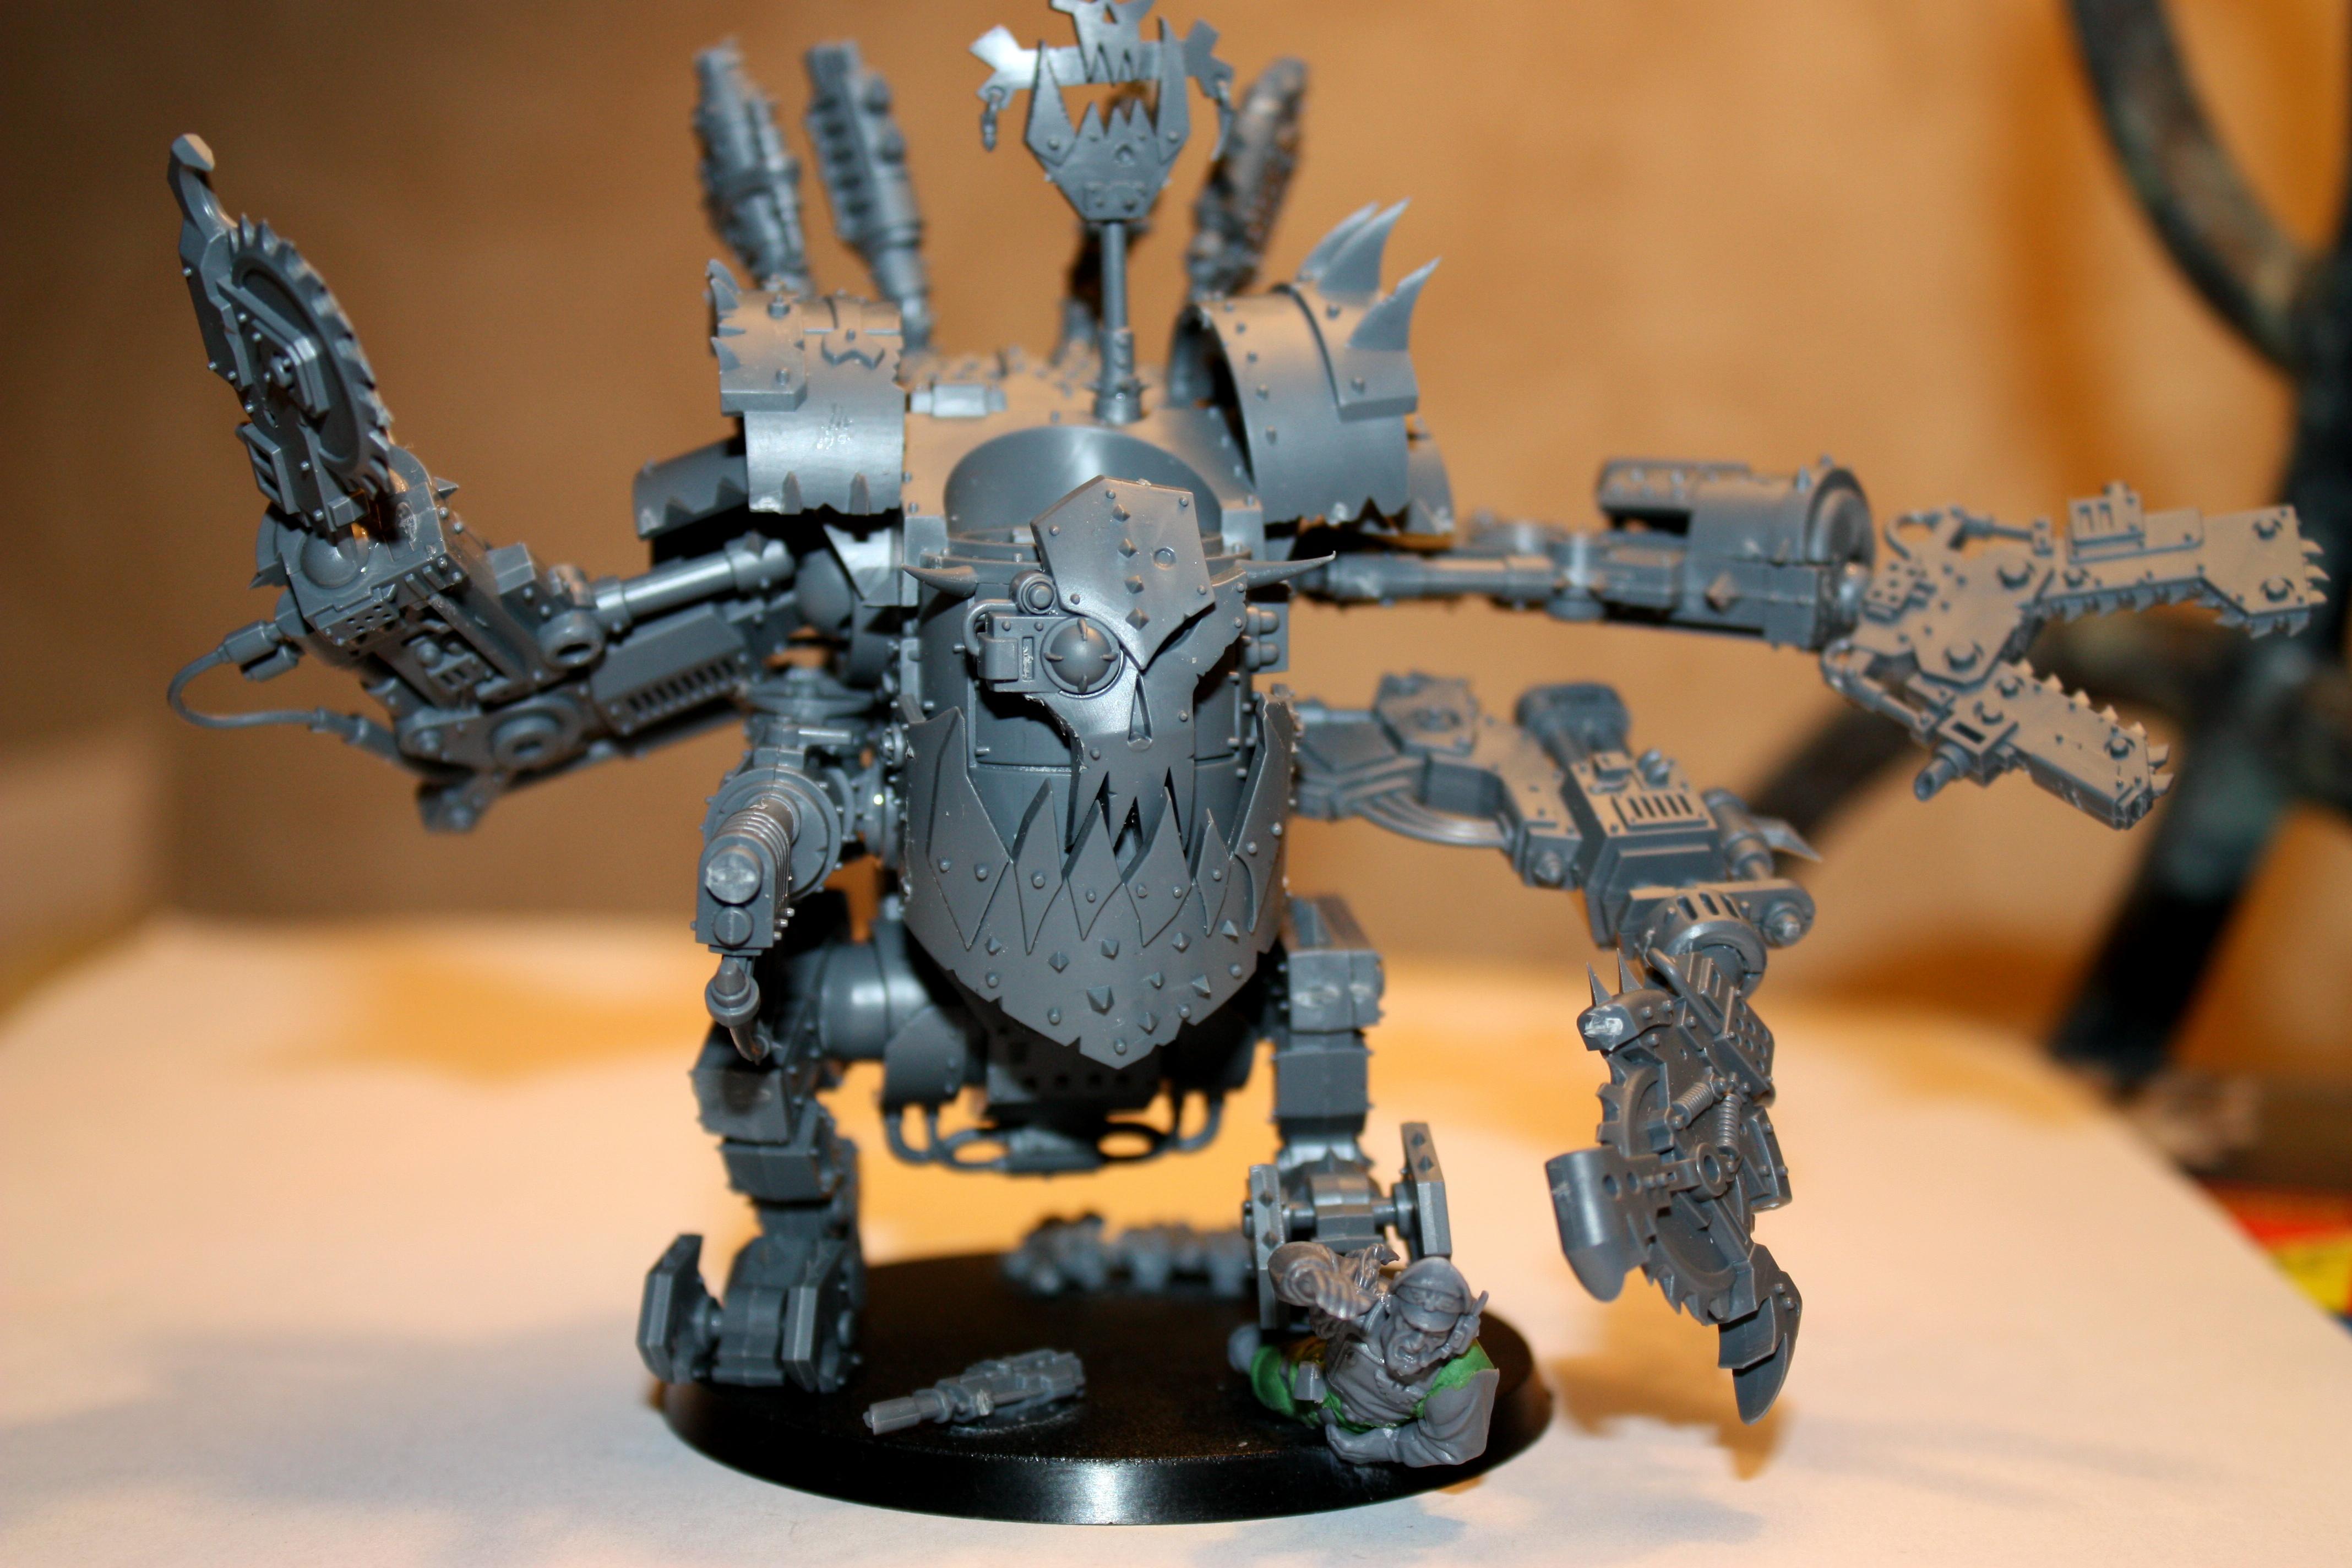 Dreadnought, Orks